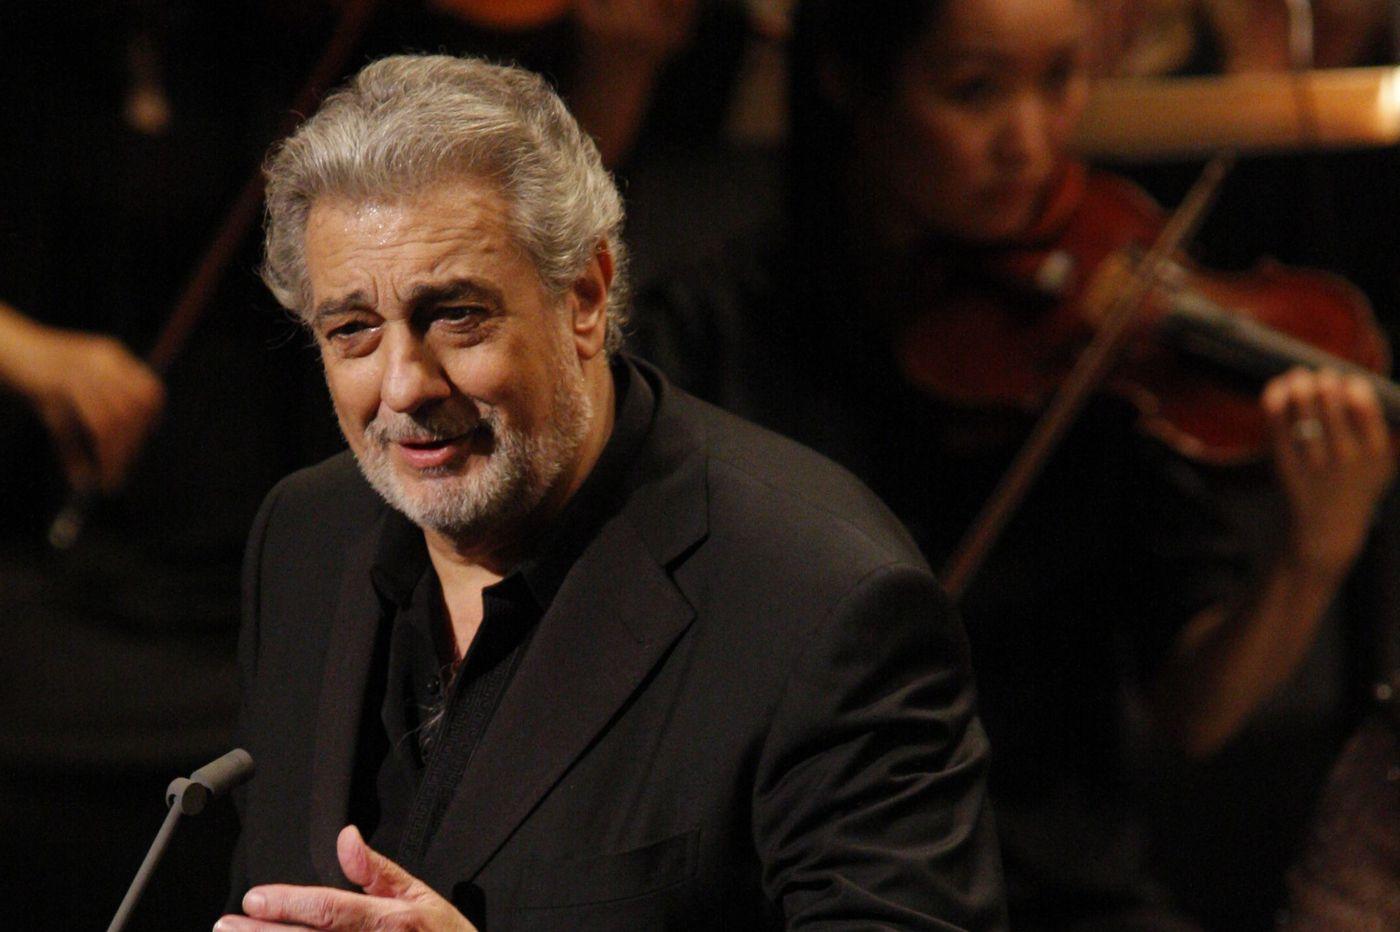 Philadelphia Orchestra's 2019-20 season spotlights women, Placido Domingo — and the Academy of Music